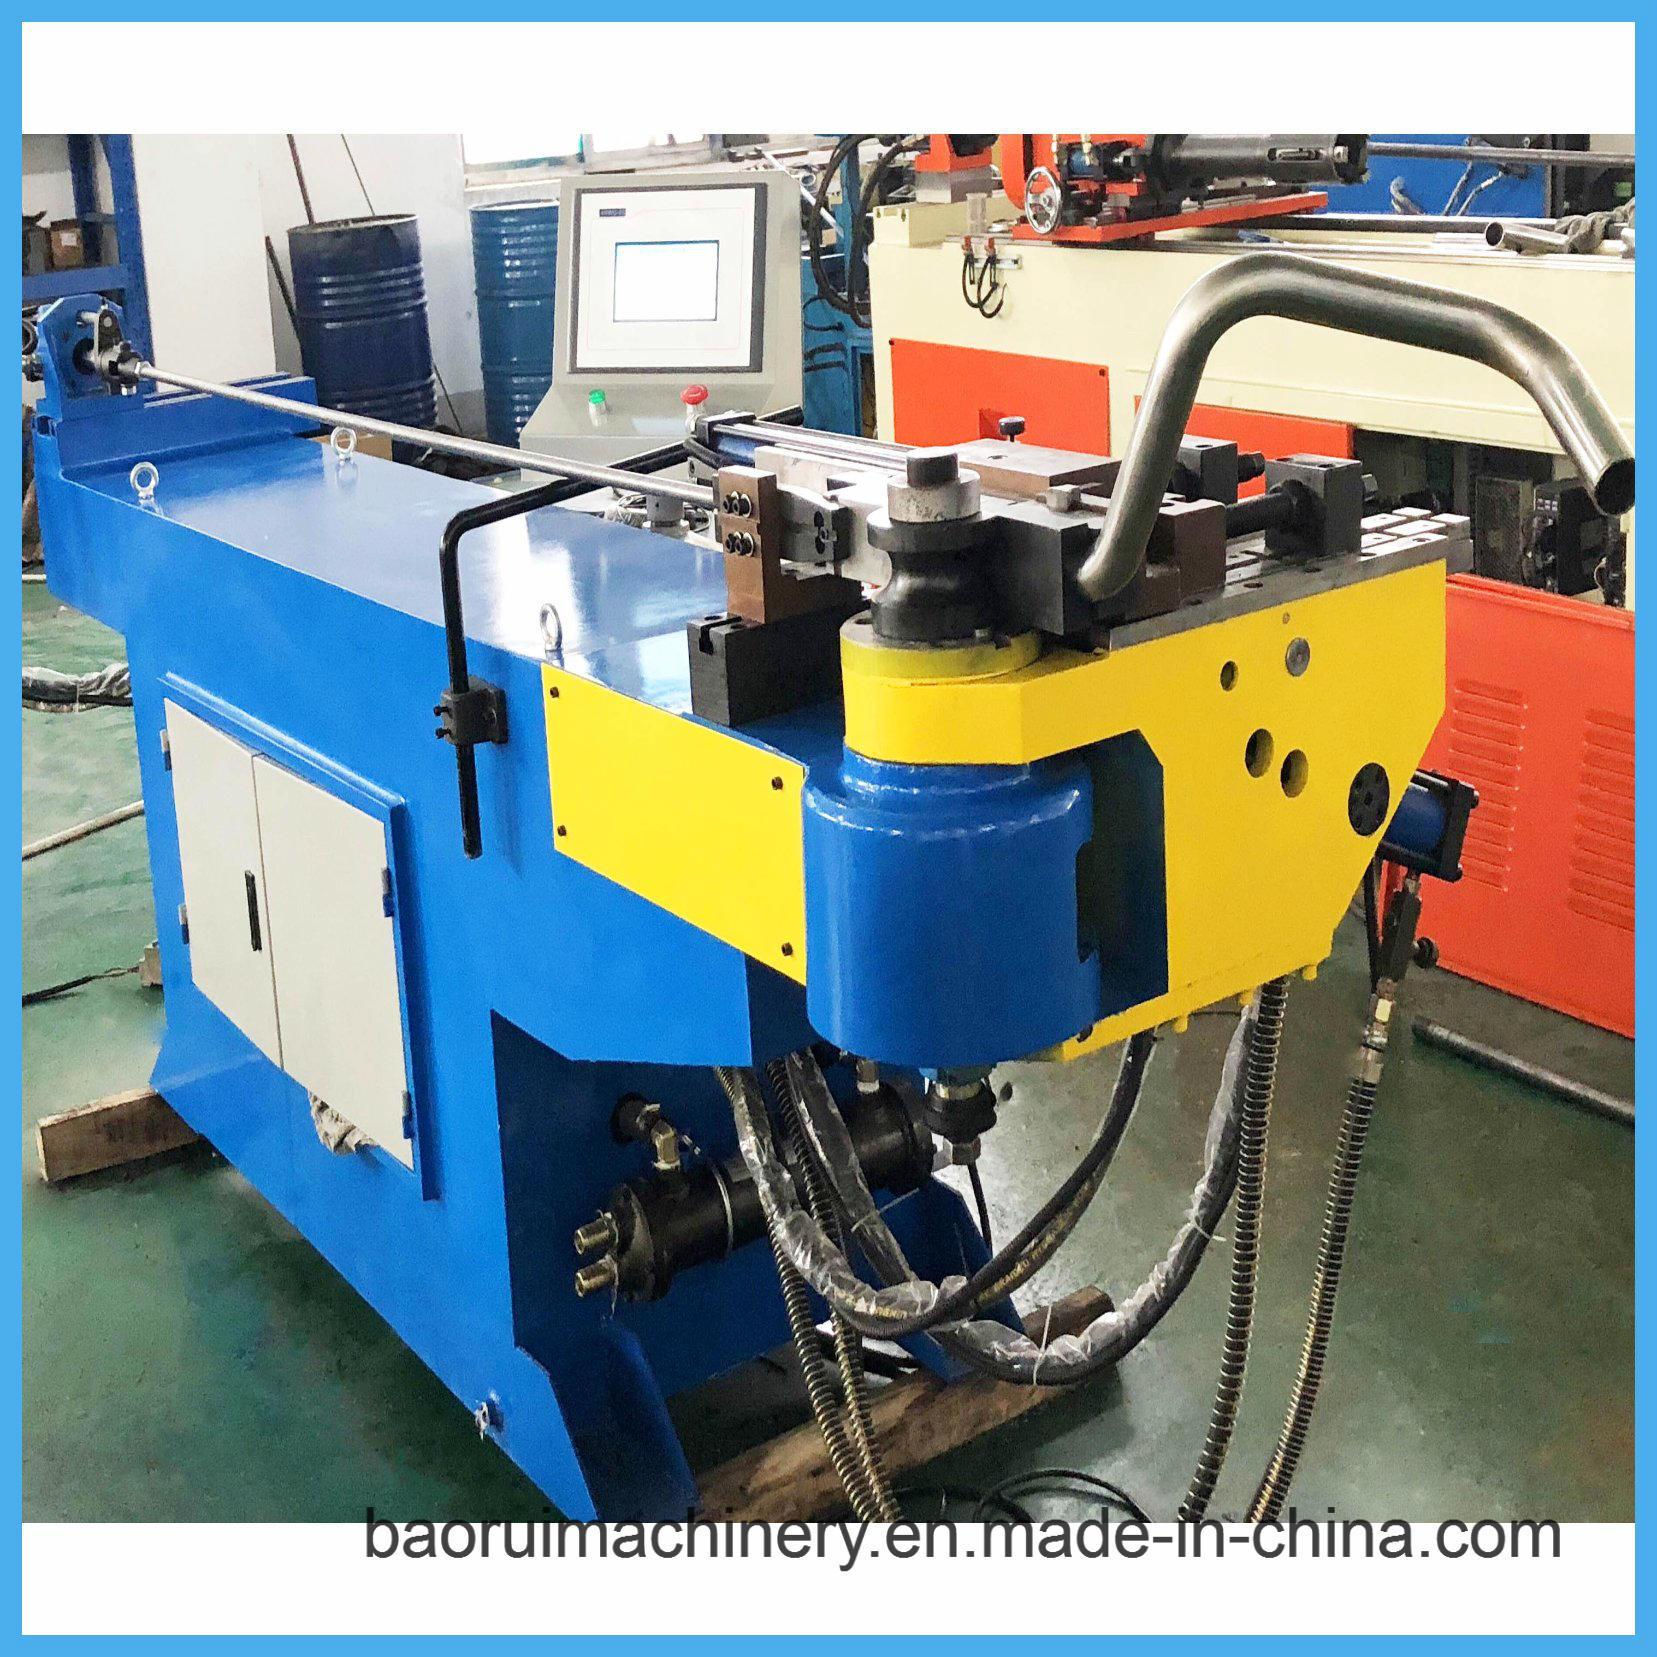 [Hot Item] Dw100nc Hydraulic Mandrel Pipe Bending Machine